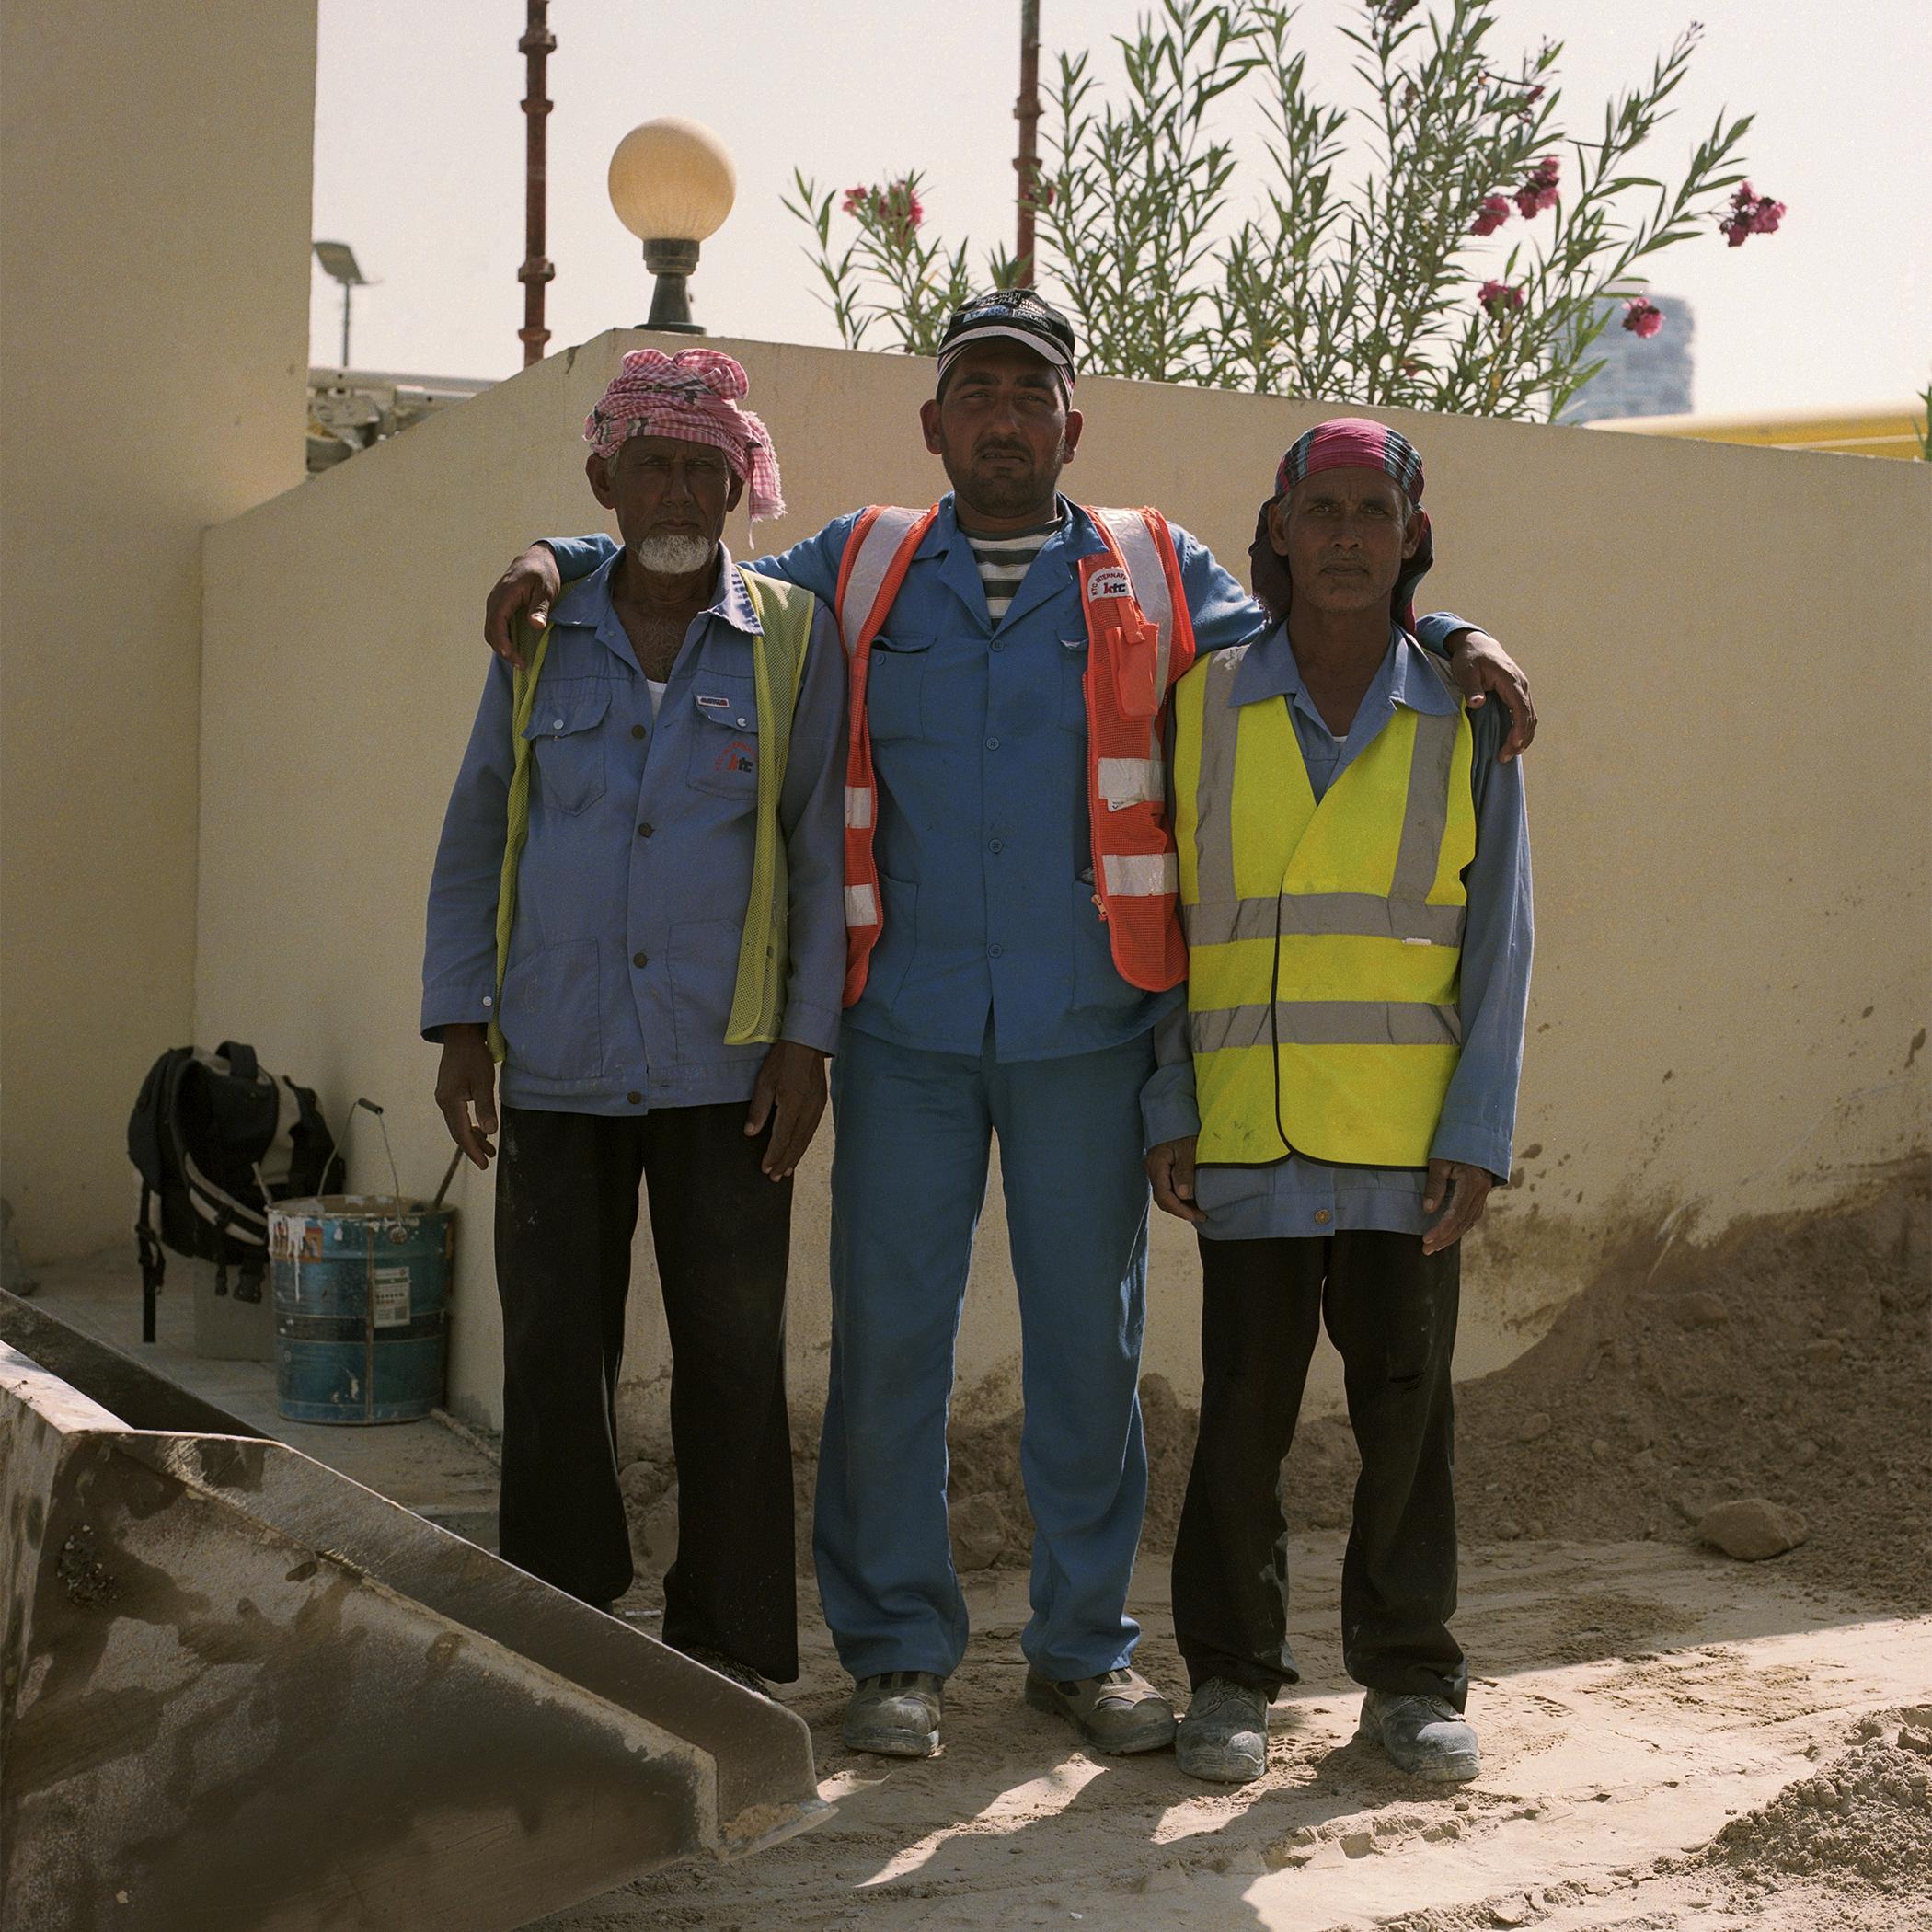 Dubai Labourers 2019